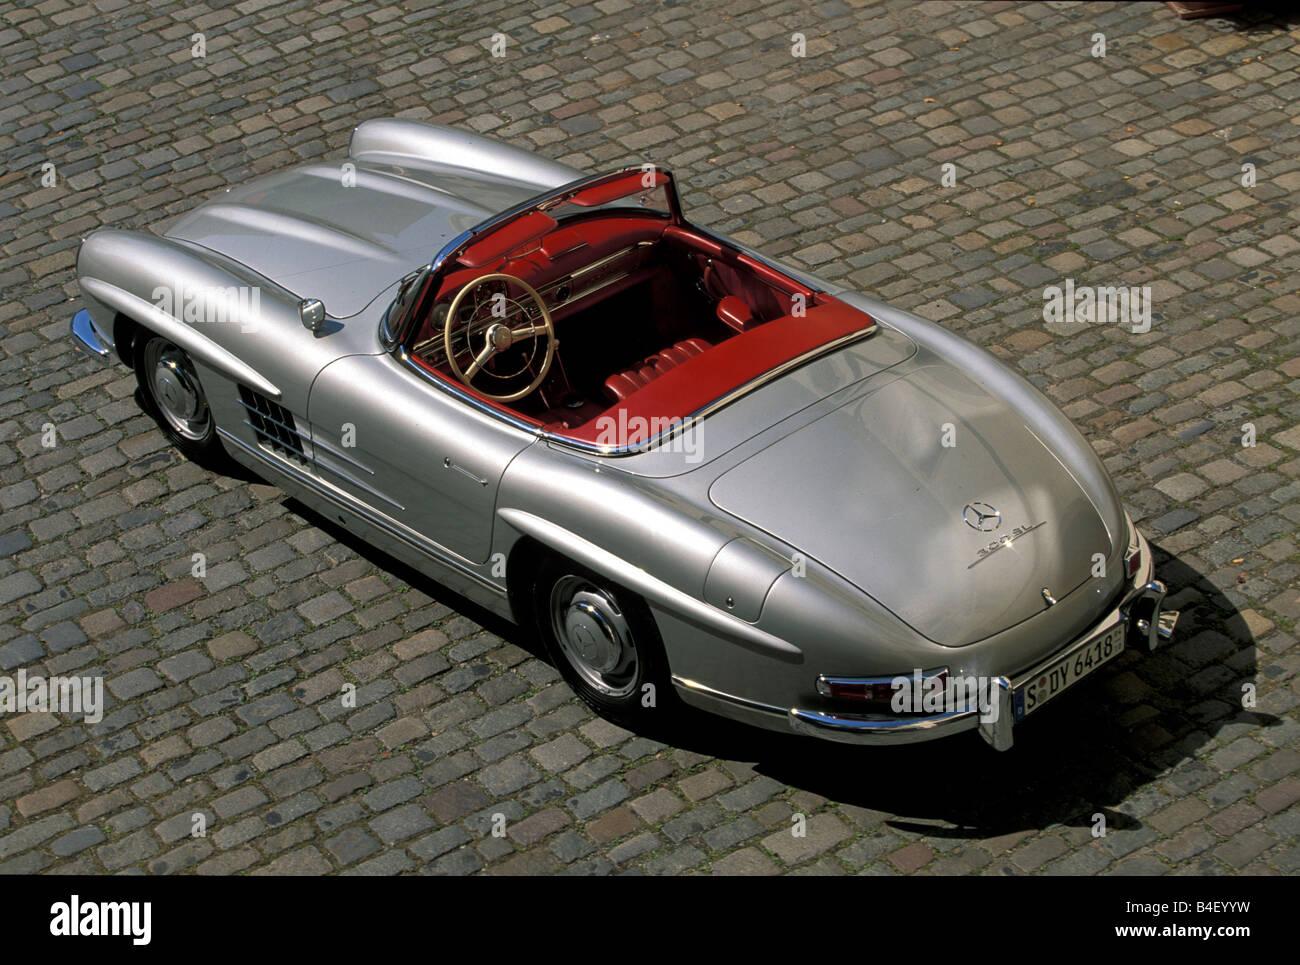 Stock Photo Car Mercedes 300 Sl Roadster Vintage Car Model Year 1957 1963 1950s 19998269